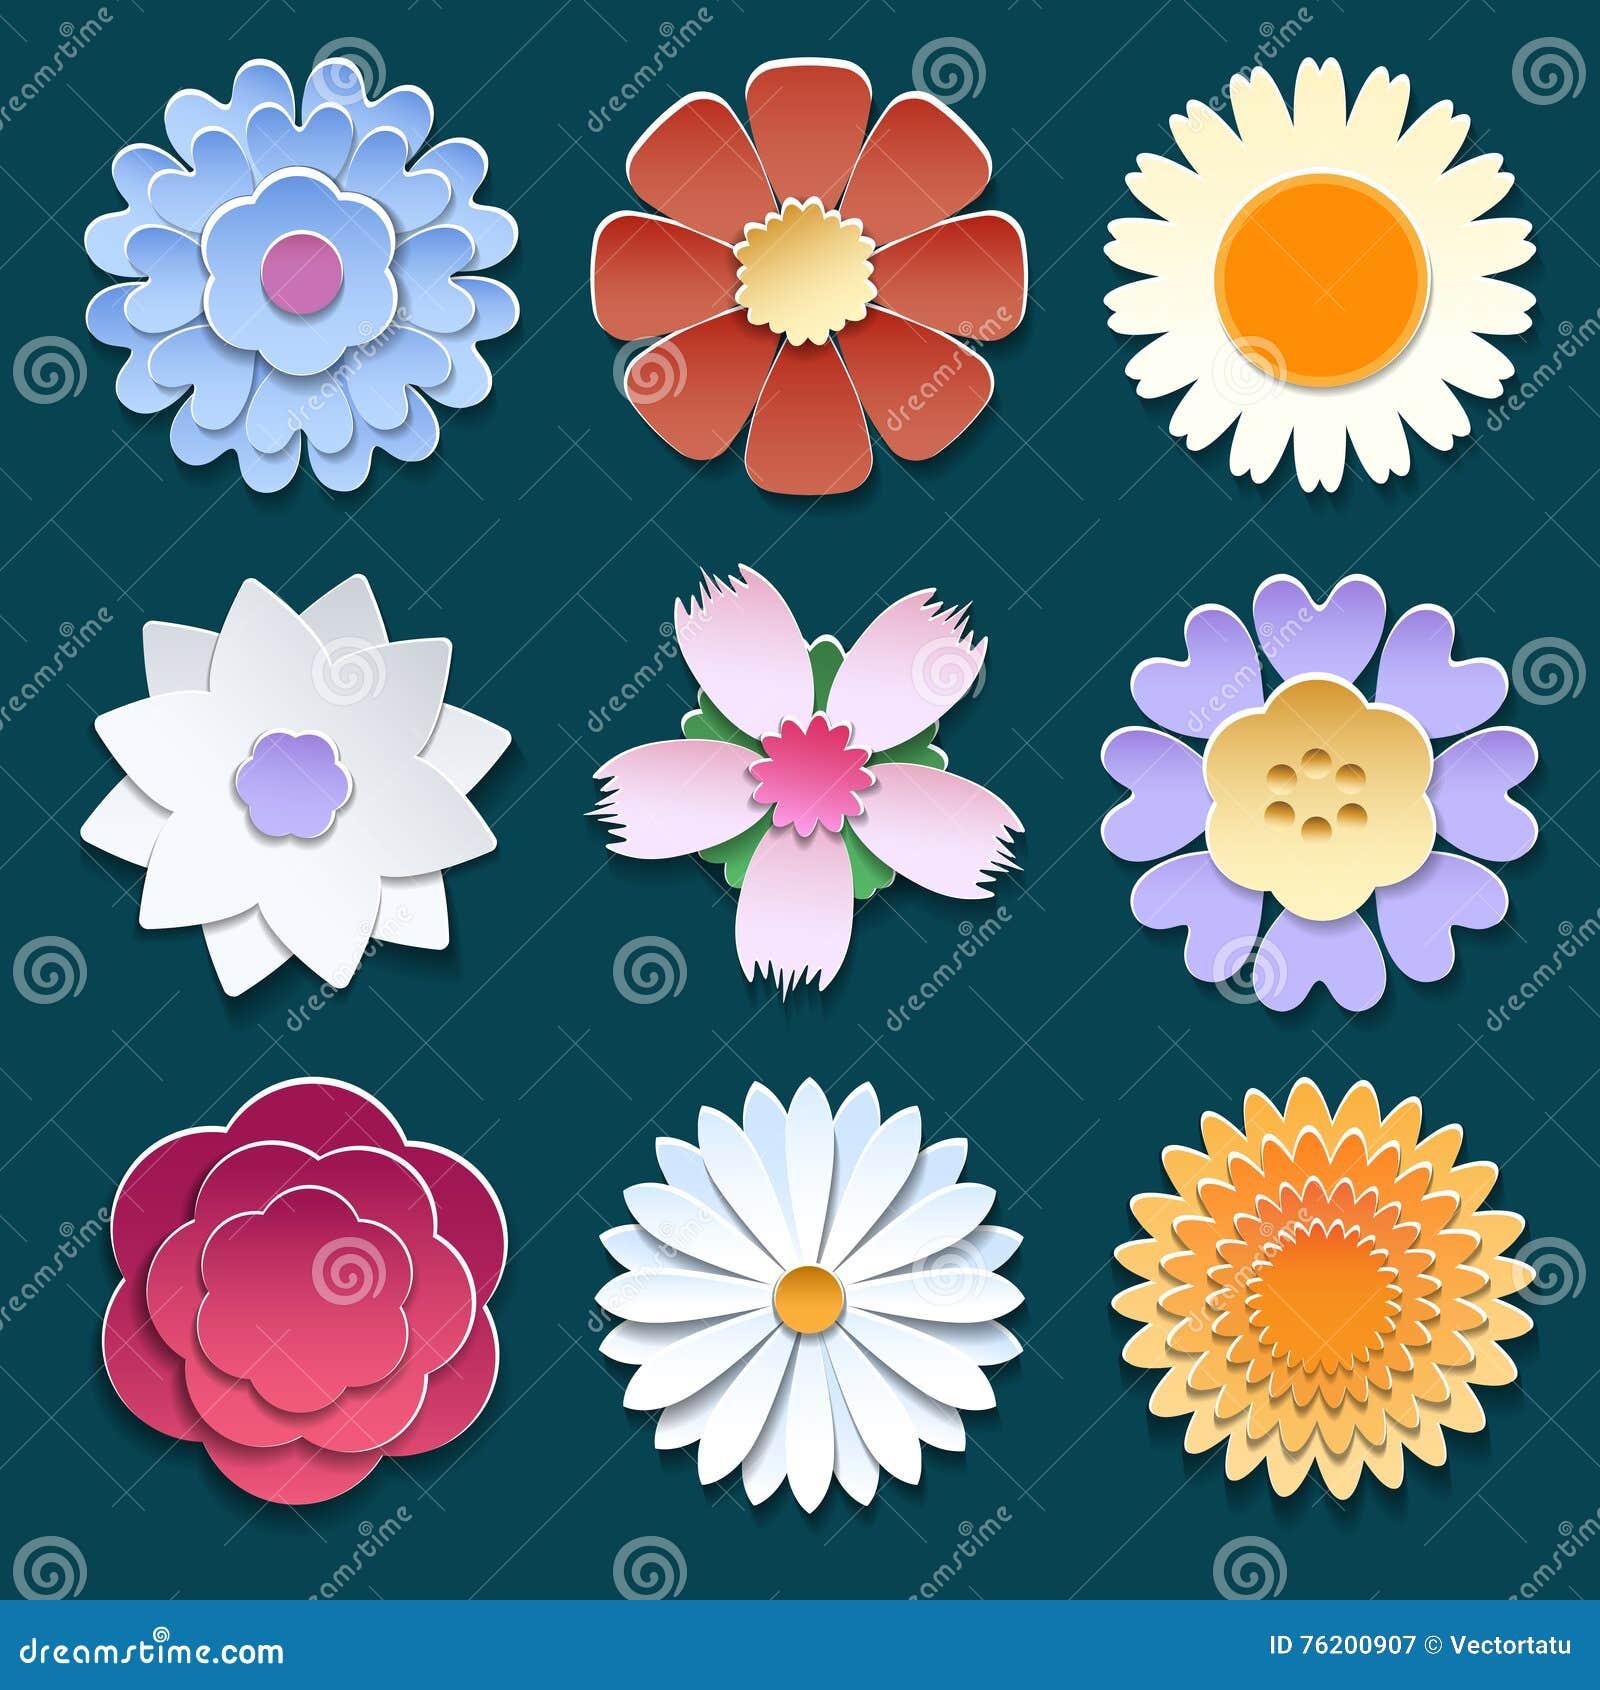 Paper 3d origami flowers set stock vector illustration of beauty paper 3d origami flowers set mightylinksfo